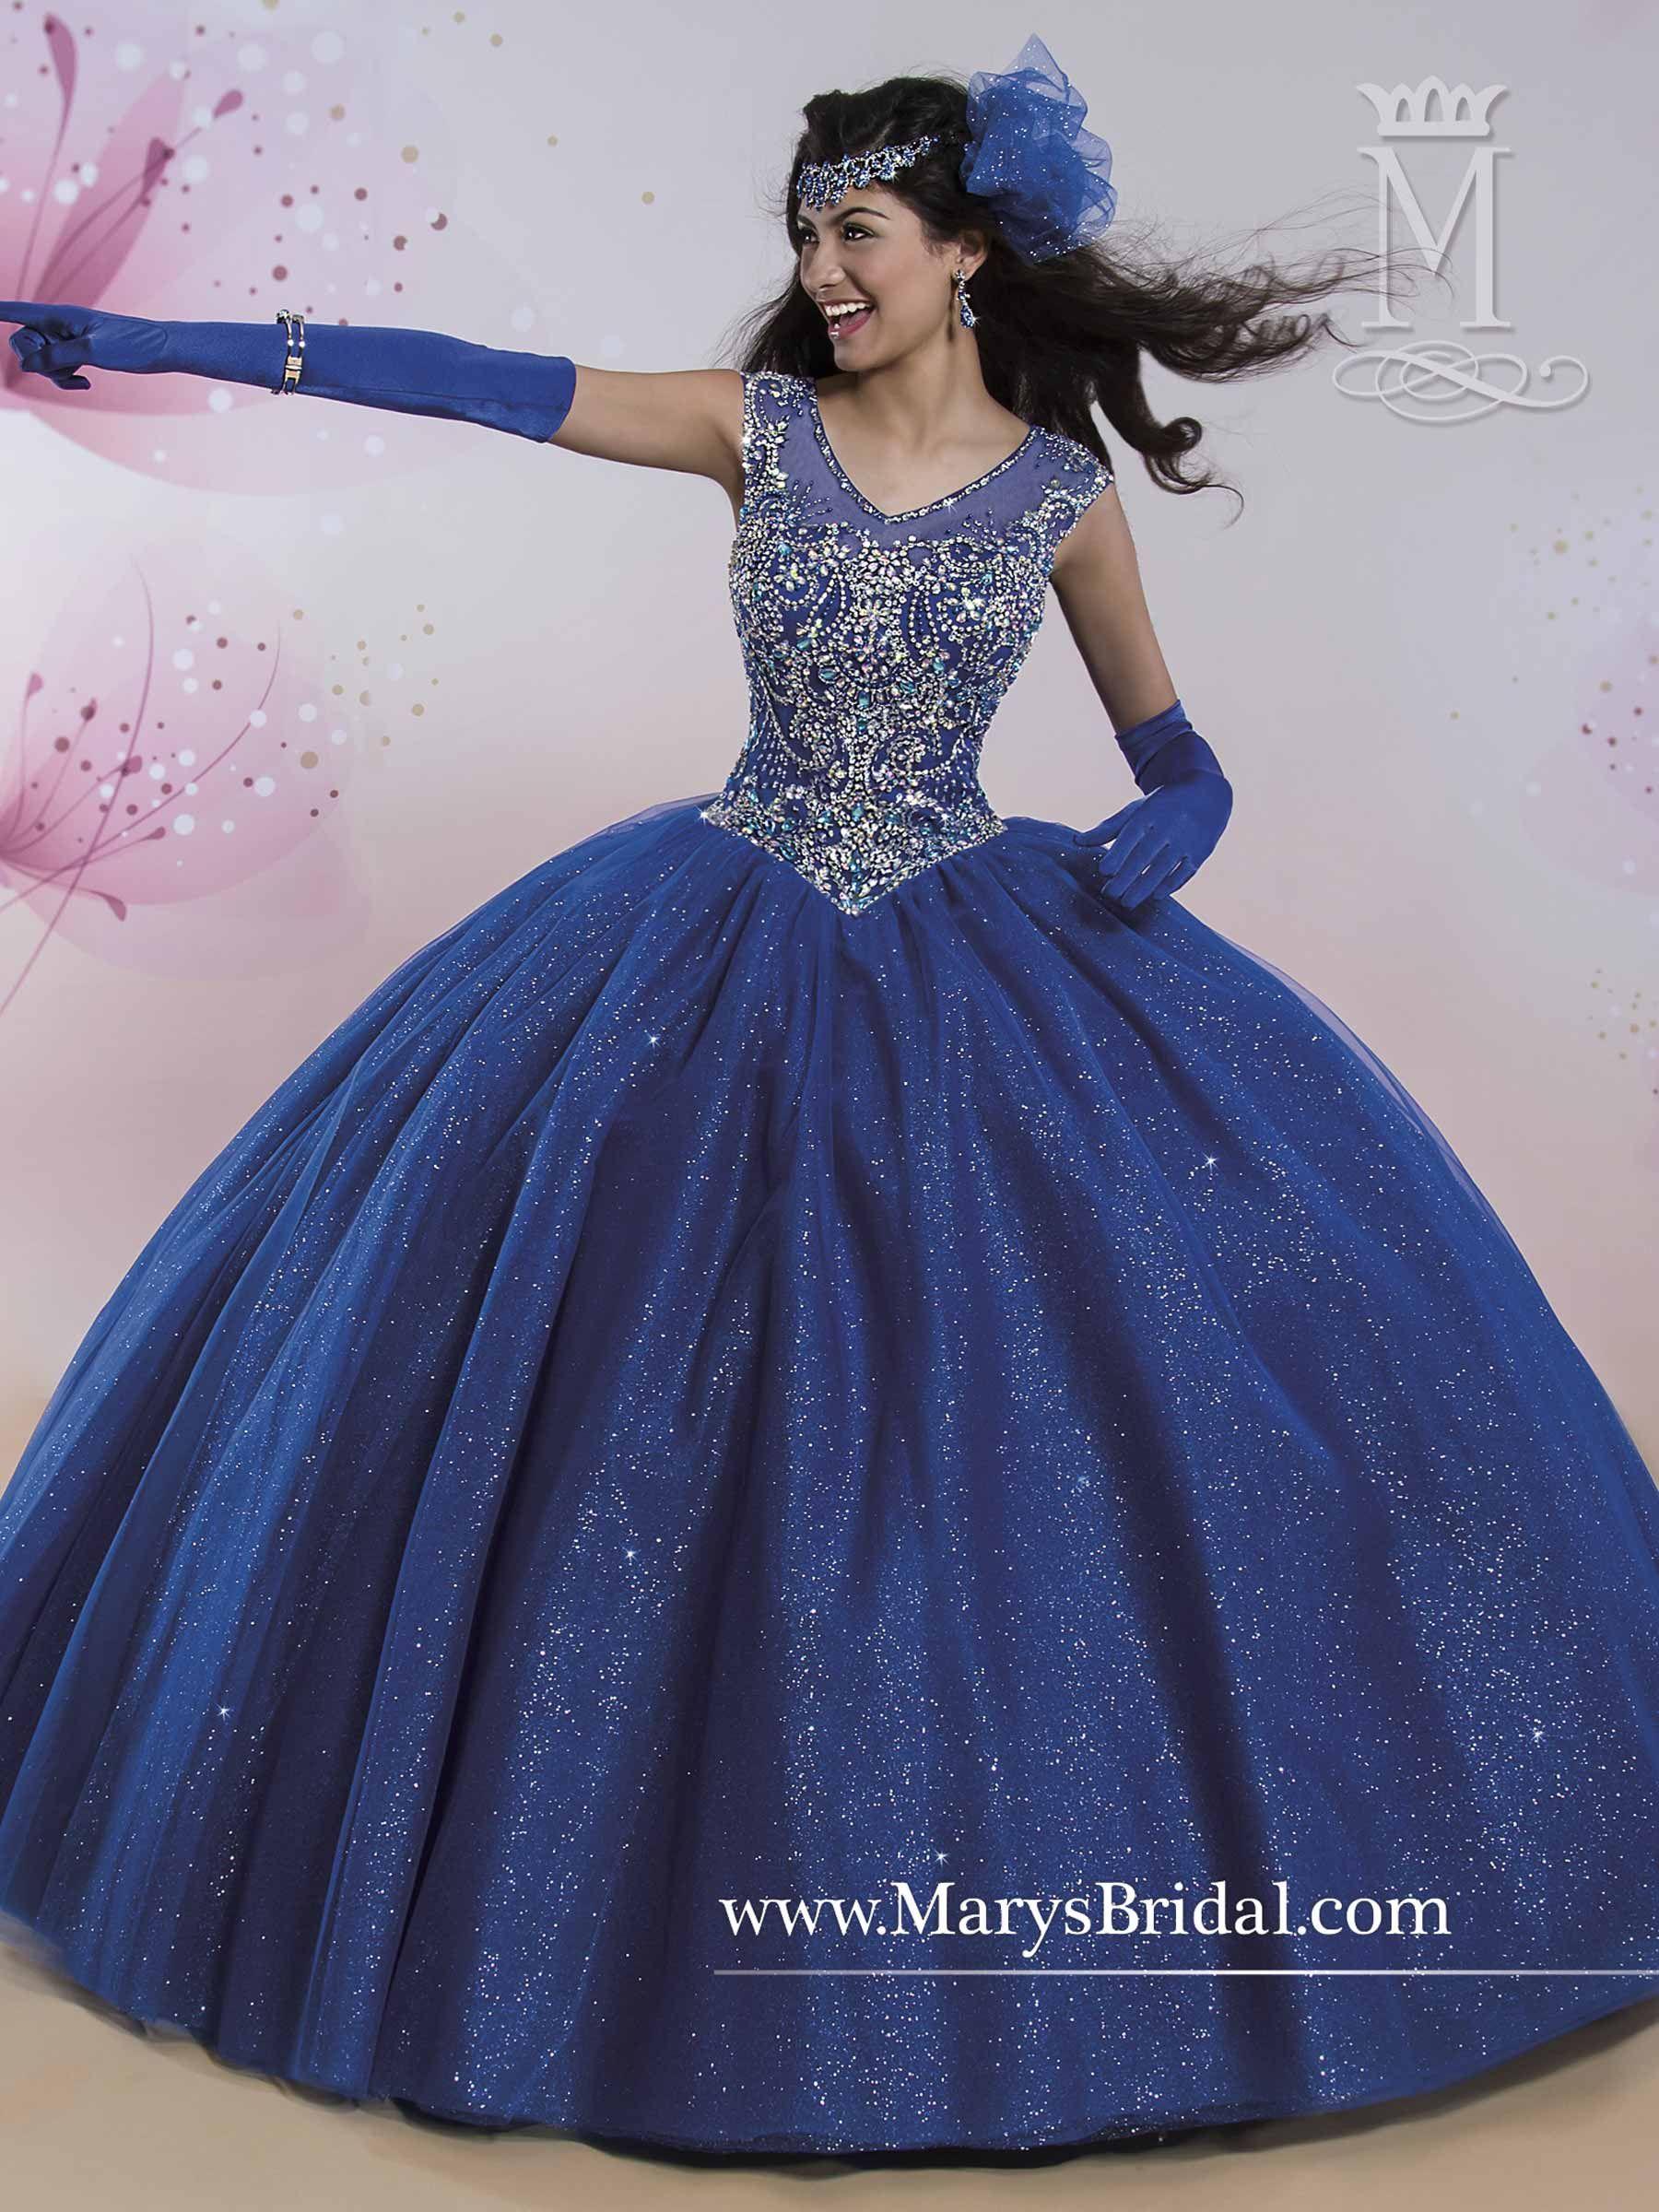 Debutante ball dresses princess style white-space